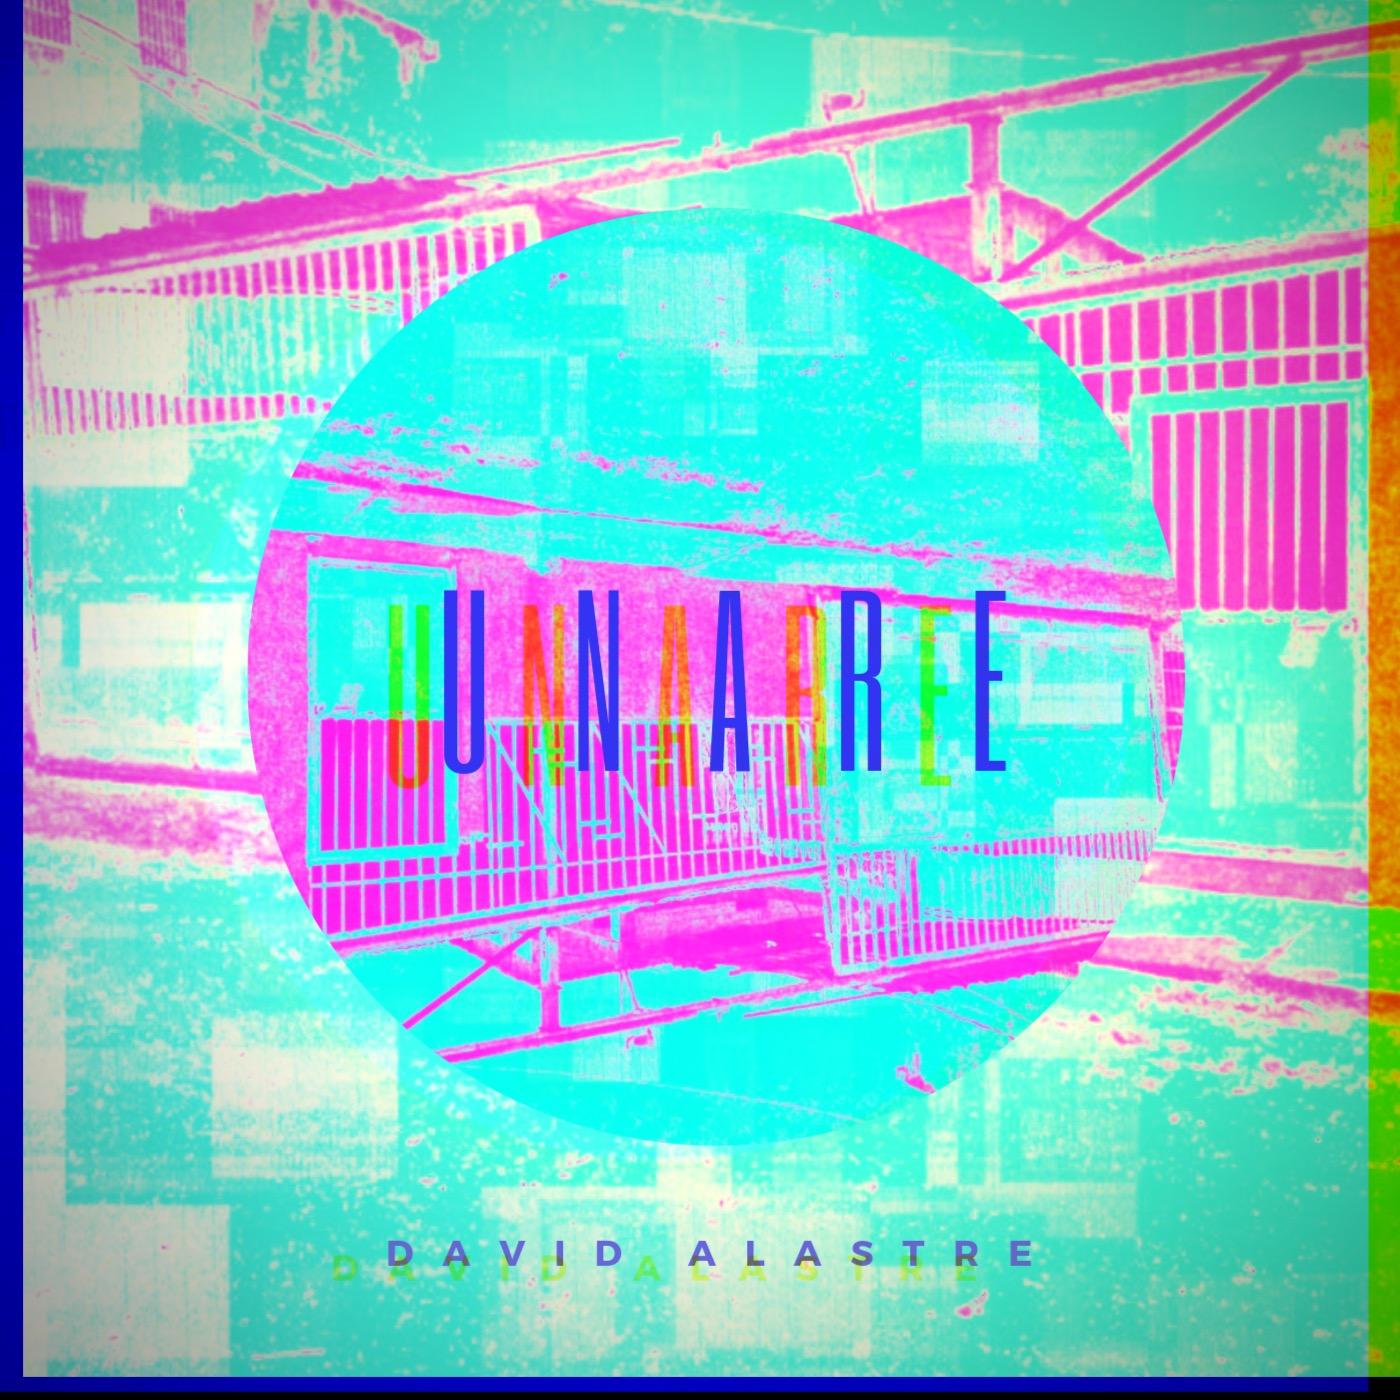 Song:  Unare   Artist: David Alastre